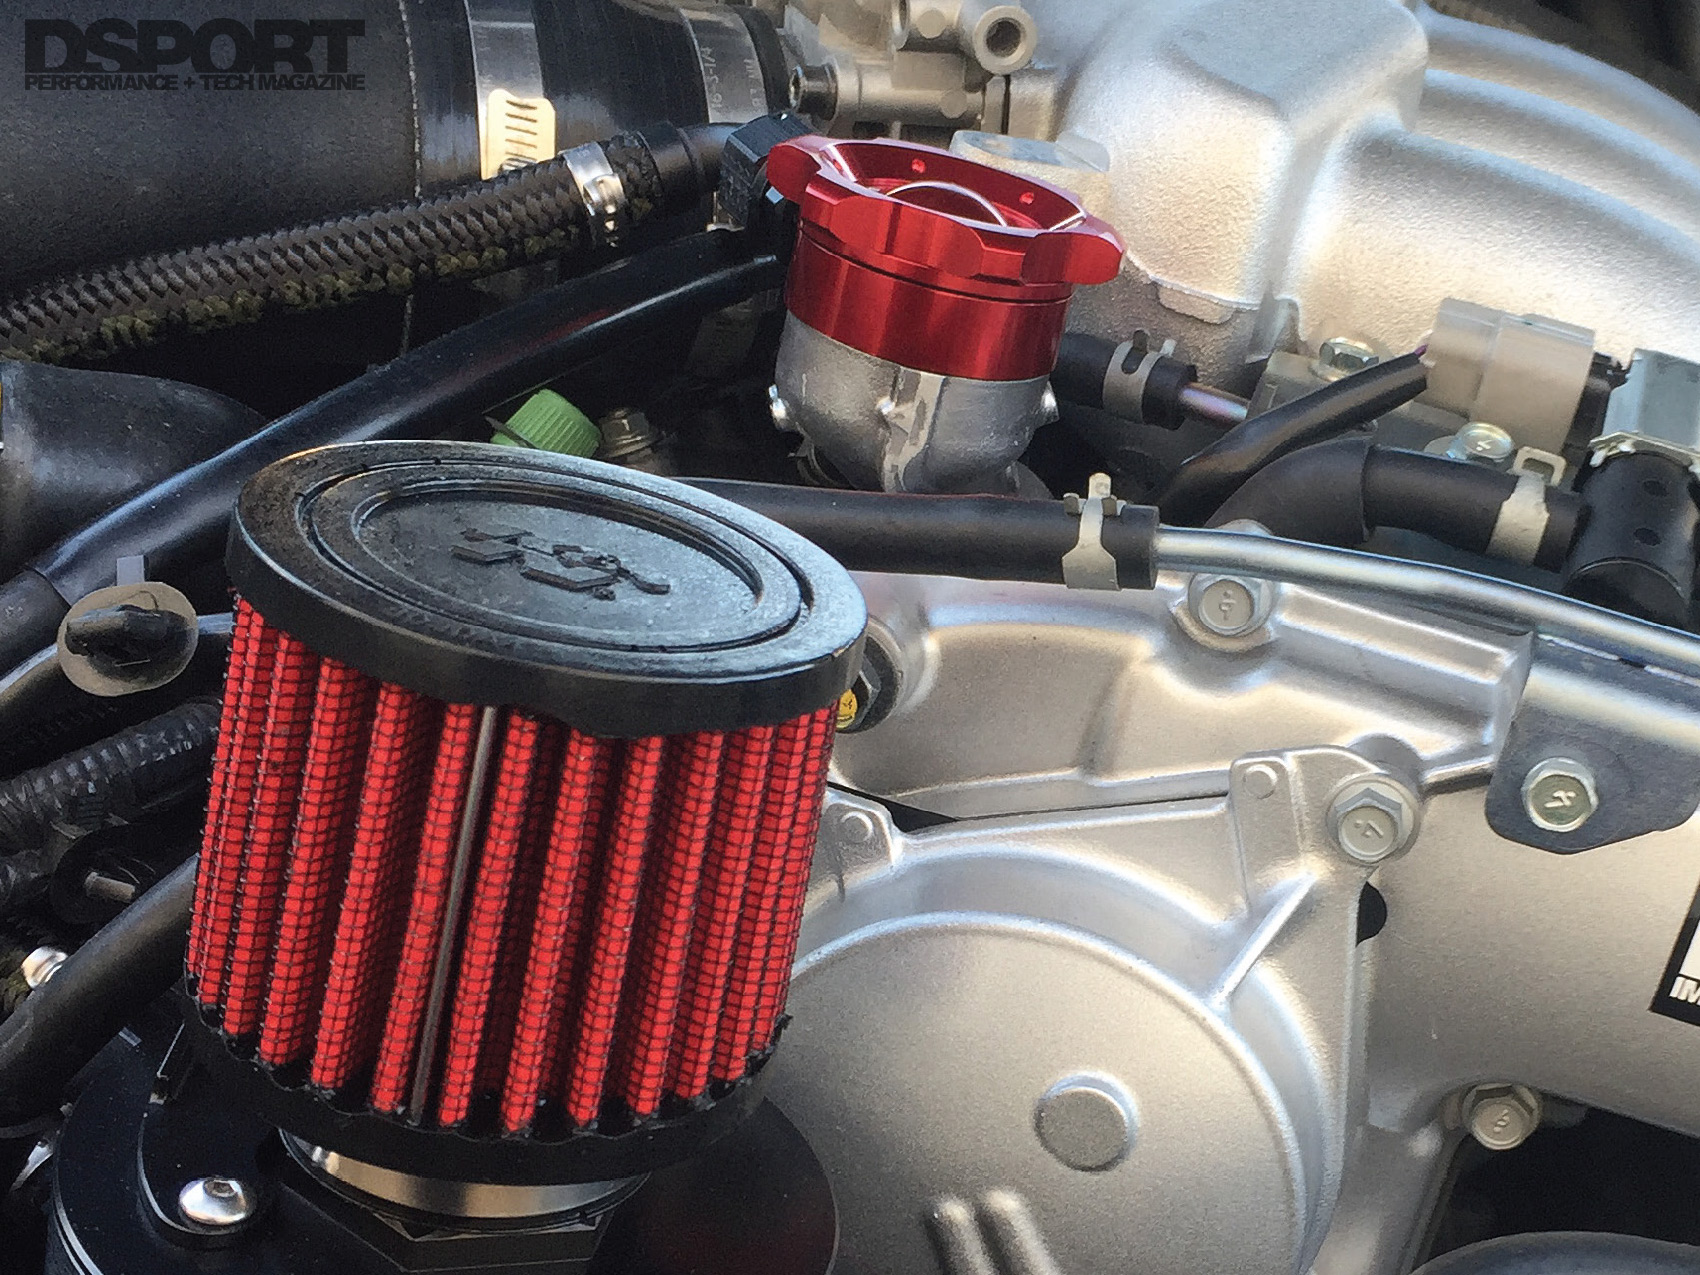 Quick Tech : Benefits of Lowering Crankcase Pressure | Part